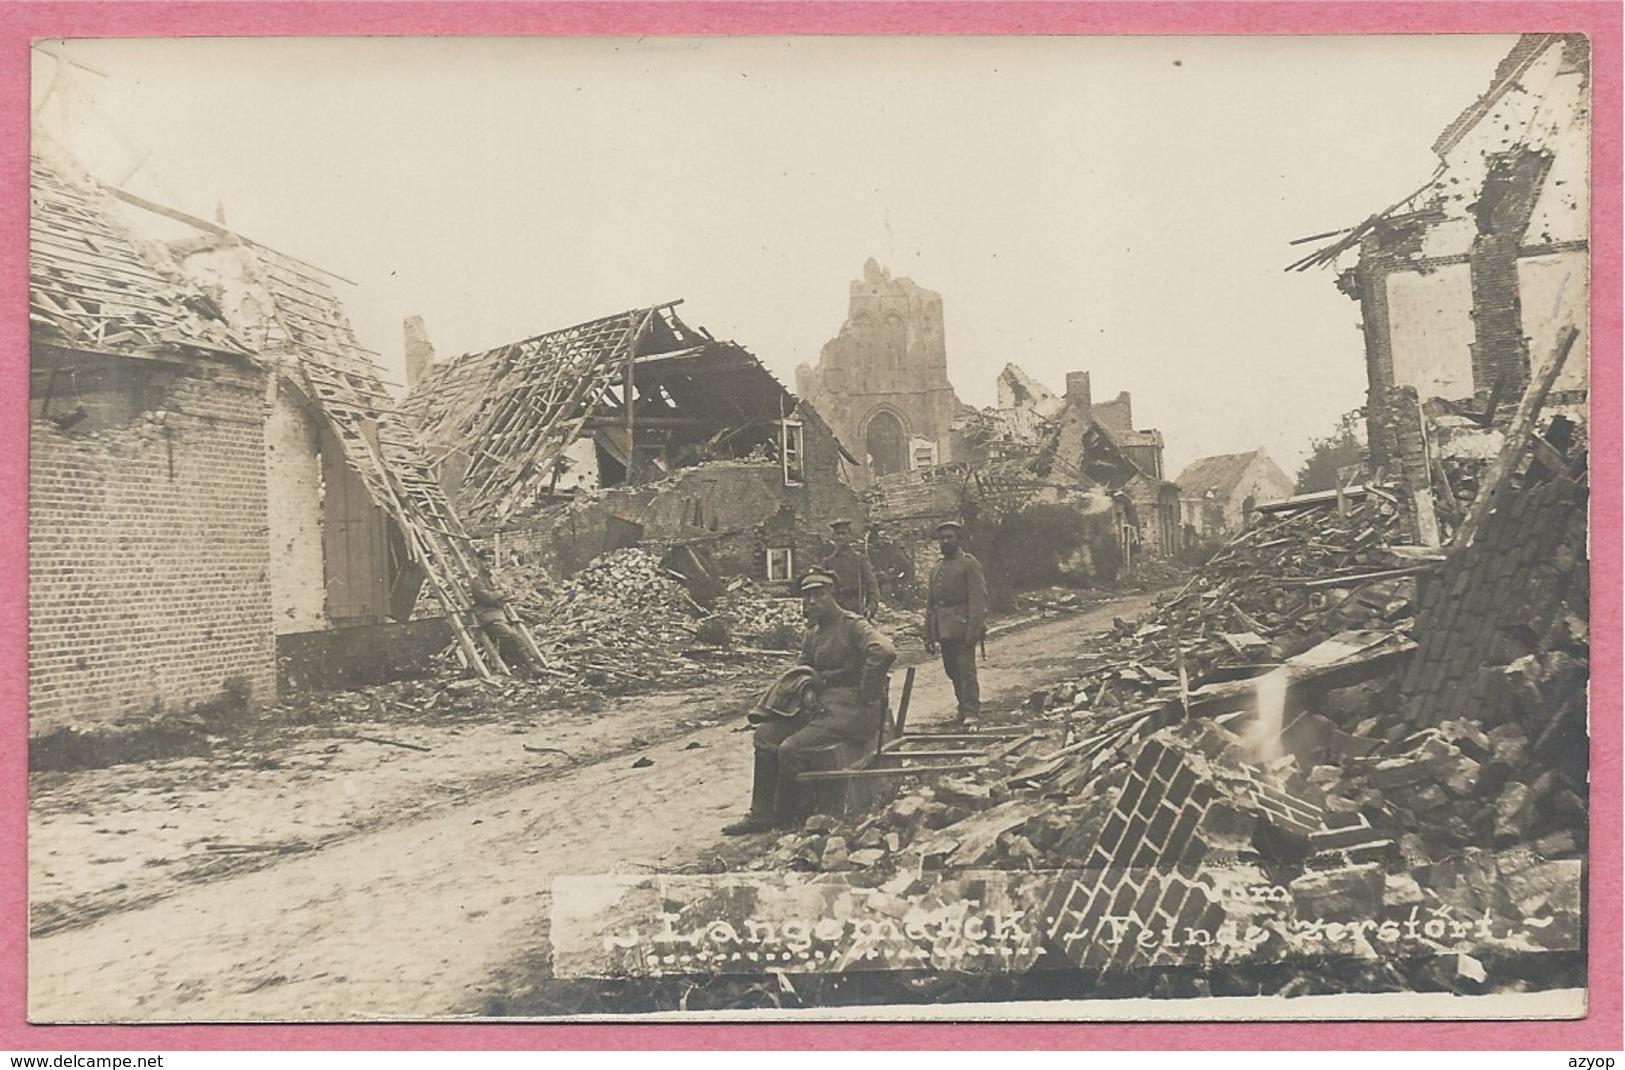 West-Vlaanderen - Flandre Occidentale - Carte Photo - Foto - LANGEMARK - Ruines - Guerre 14/18 - Carte N° 38 - Langemark-Poelkapelle